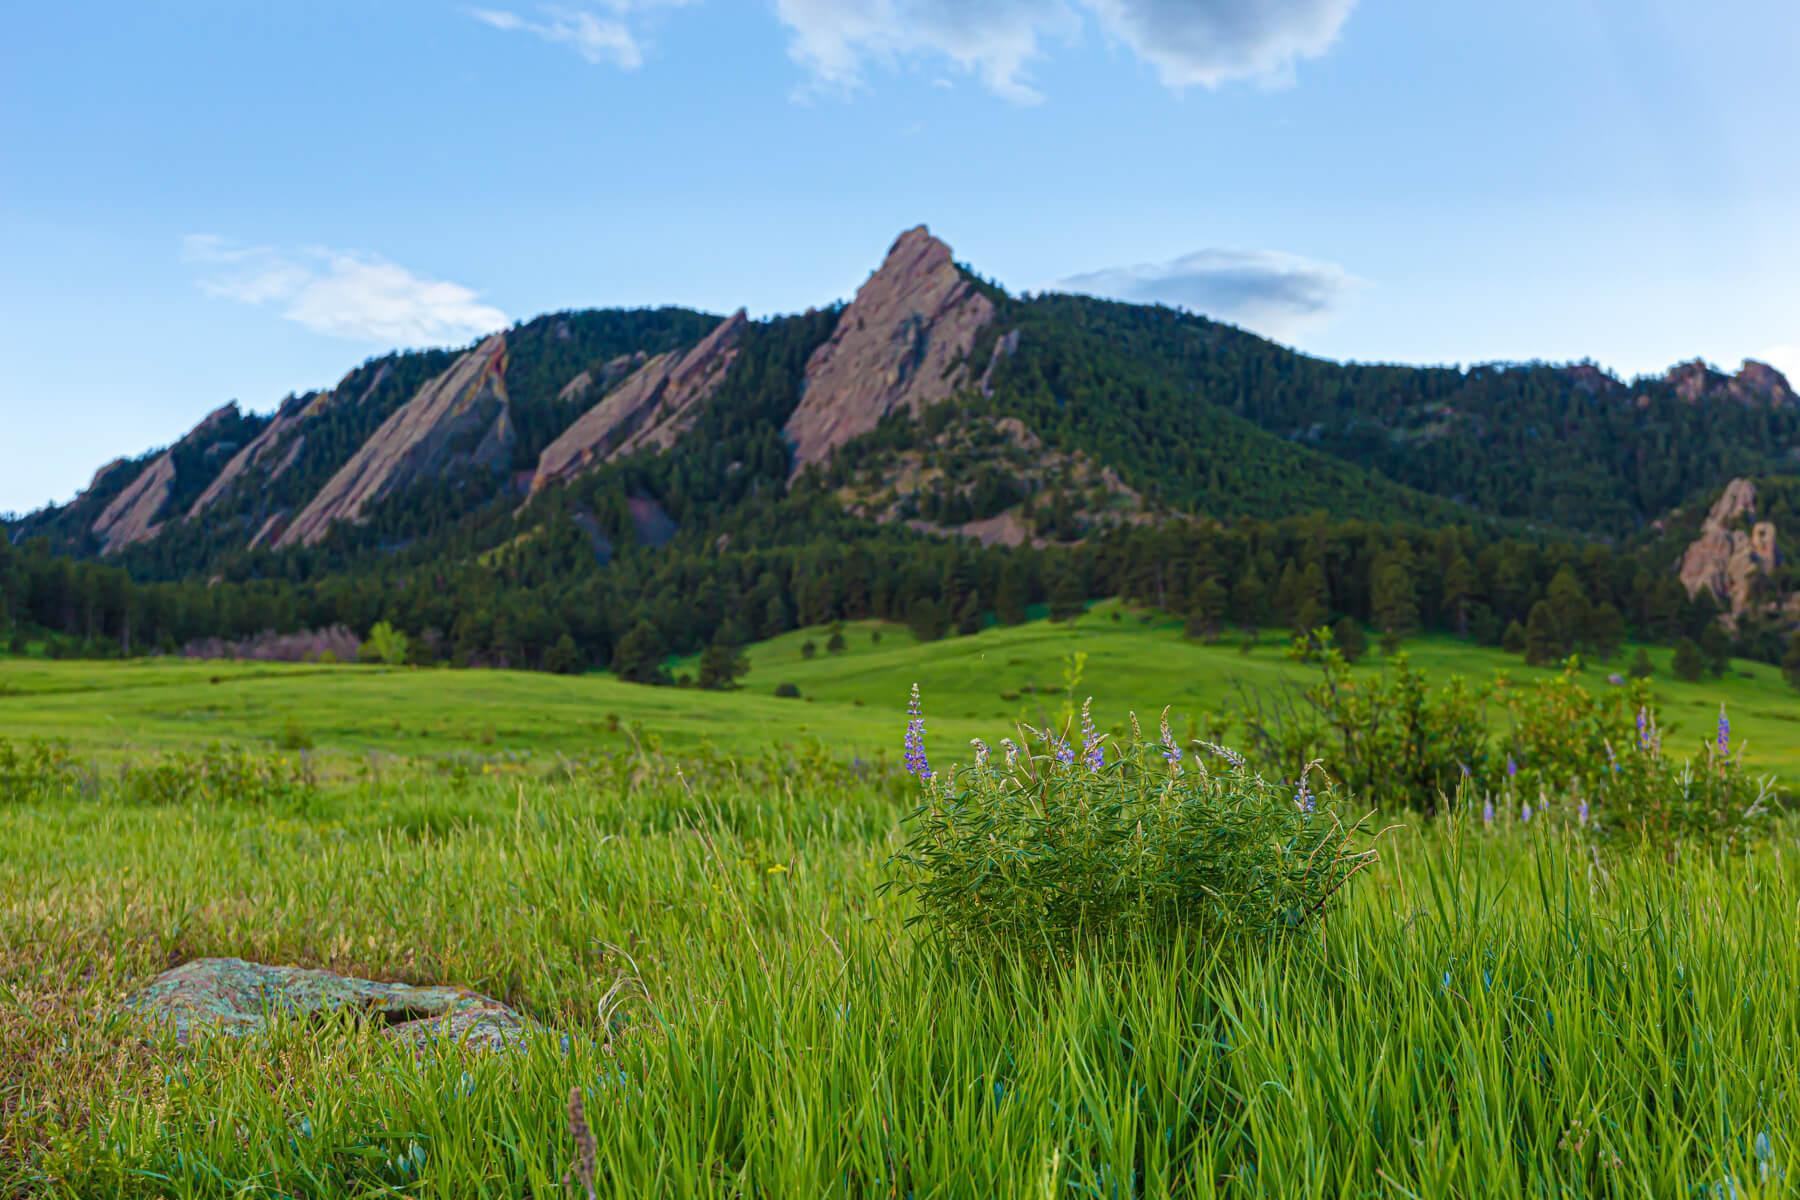 Boulder Flatiron Mountains with purple flowers - Heather Kemp Realtor